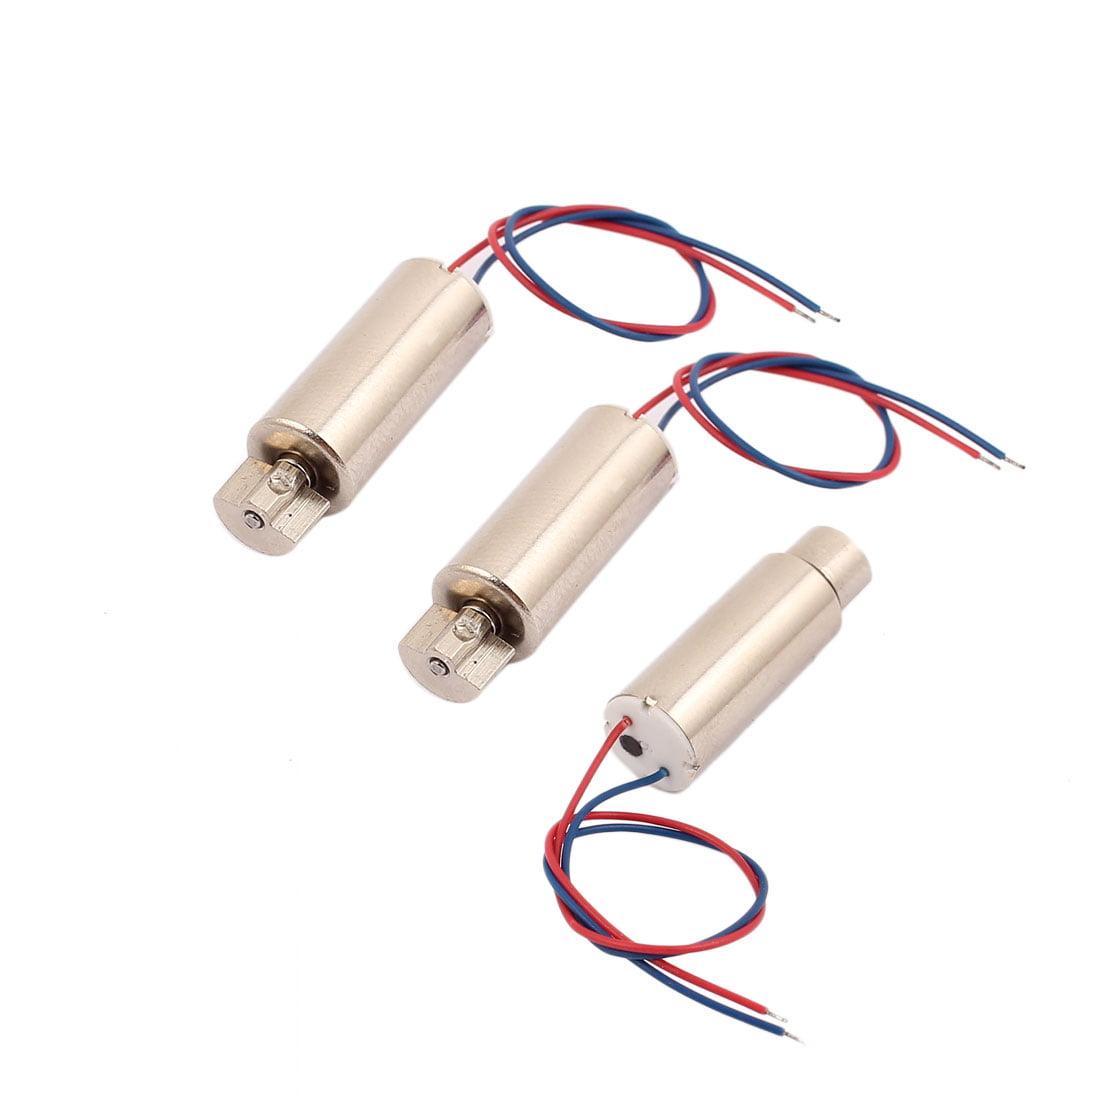 3Pcs DC 1.5V-4.5V 50000RPM High Speed Vibration Motor Magnetic Coreless Motor